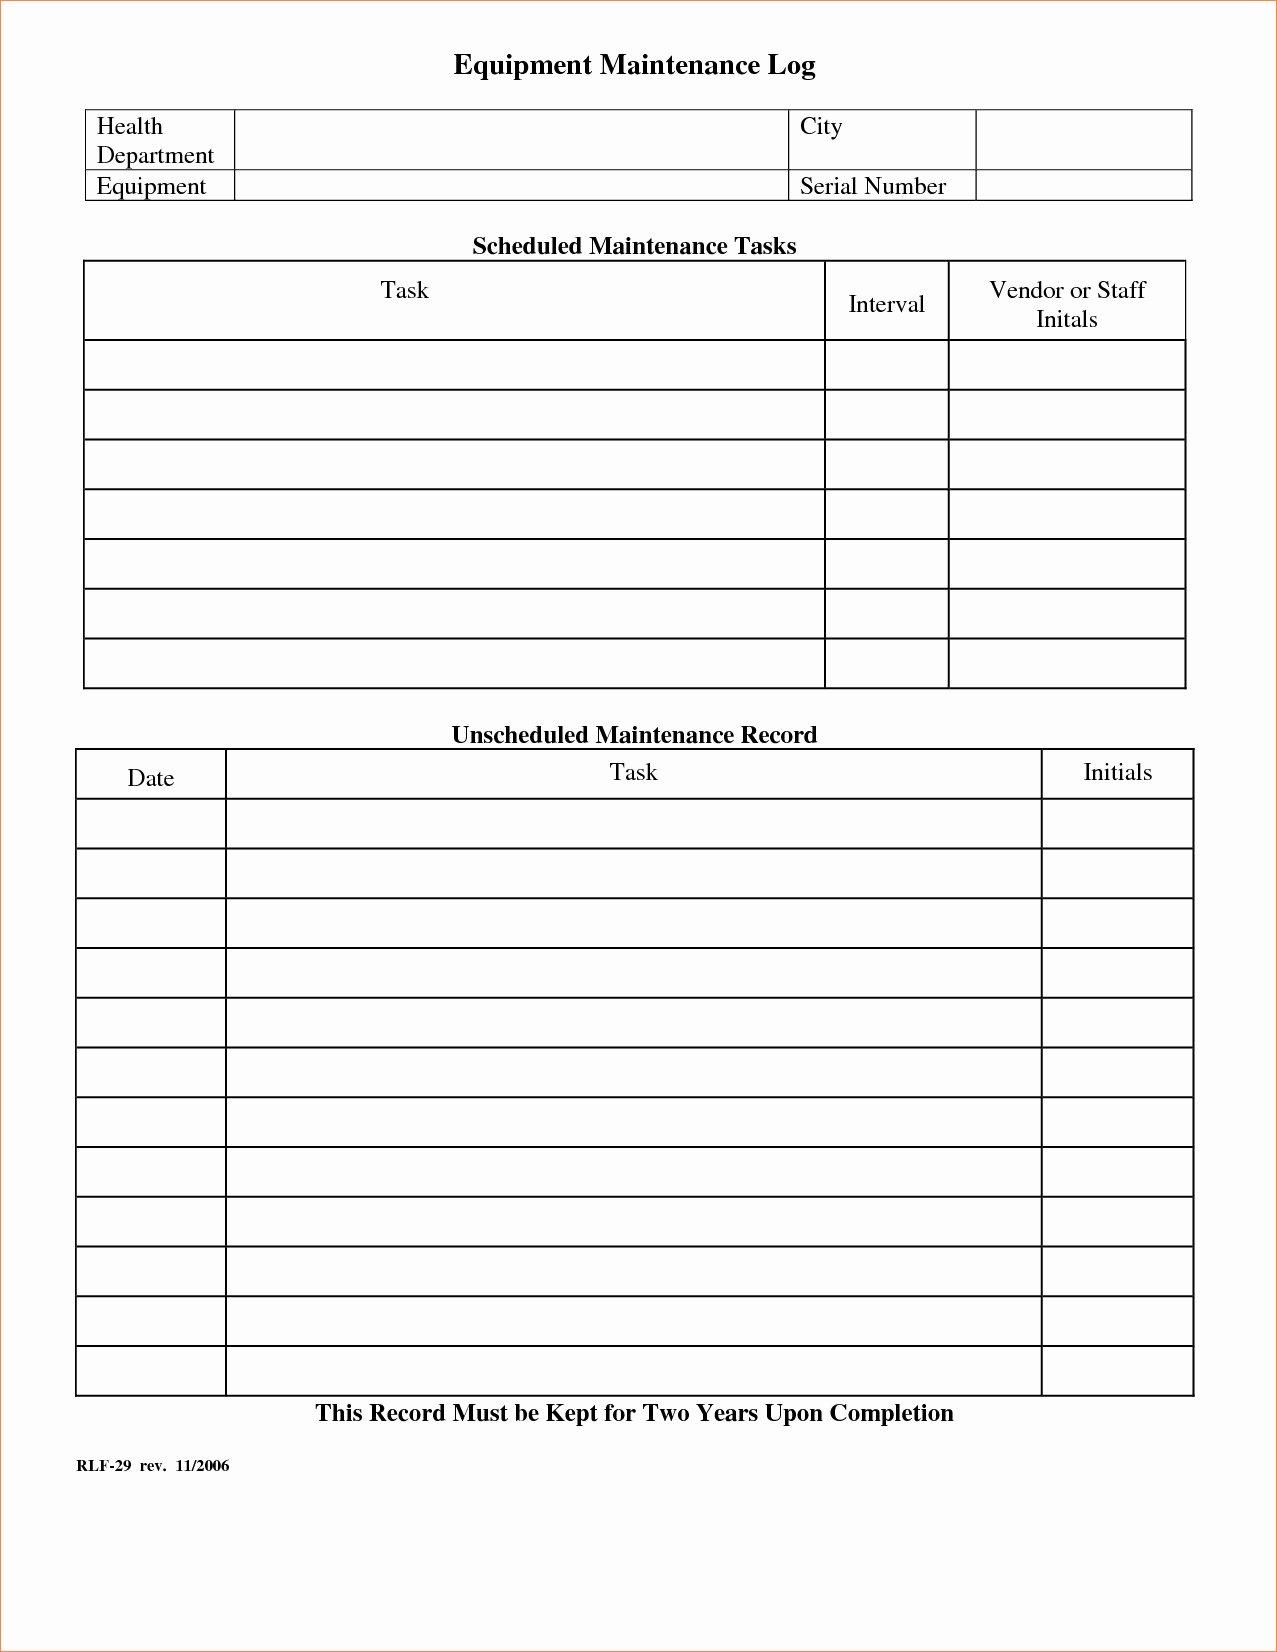 Equipment Maintenance Log Template Excel Luxury Equipment Maintenance Tracking Spreadsheet Spreadsheet